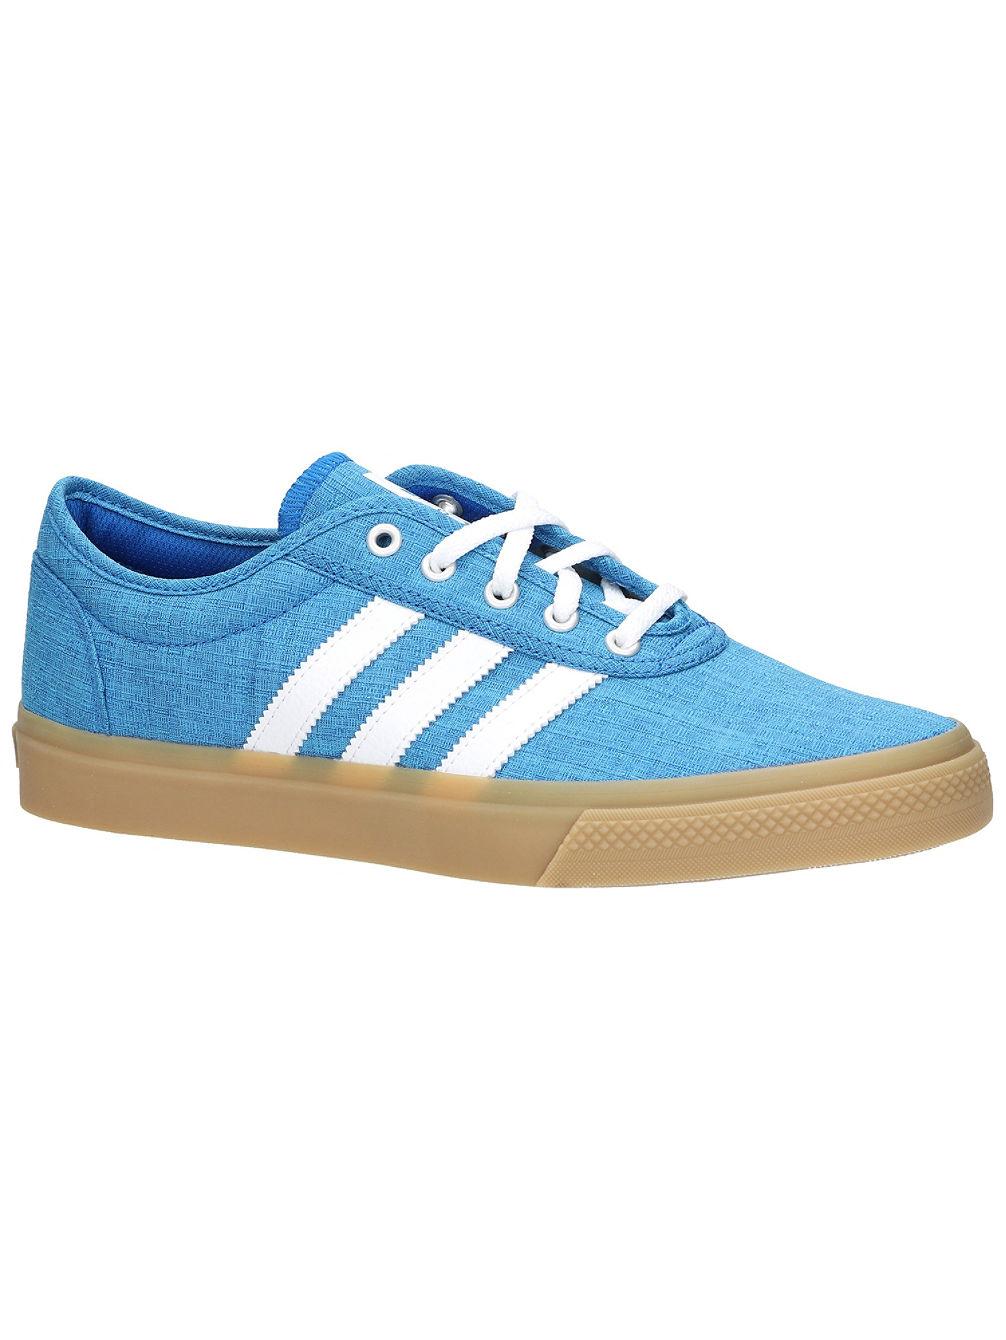 9b74c2c4dbe3ea Buy adidas Skateboarding Adi Ease Skate Shoes online at blue-tomato.com